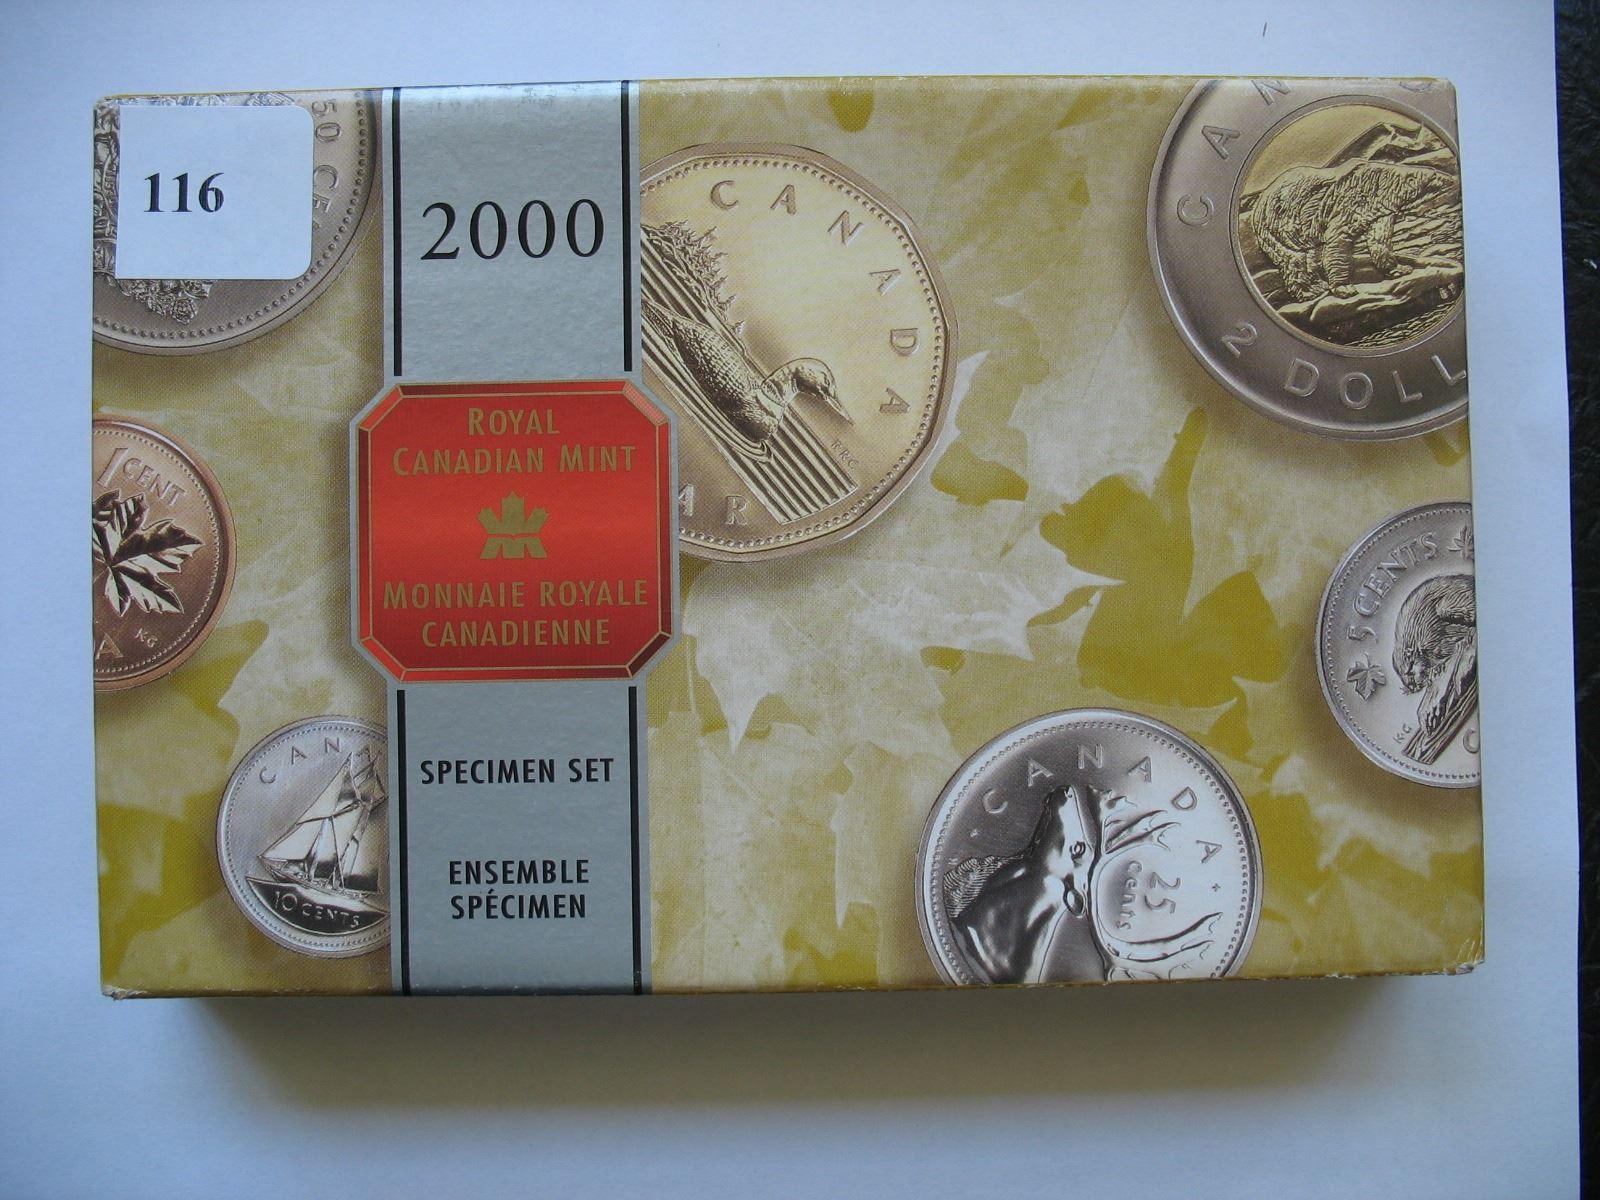 2000 Royal Canadian Mint - Specimen Set